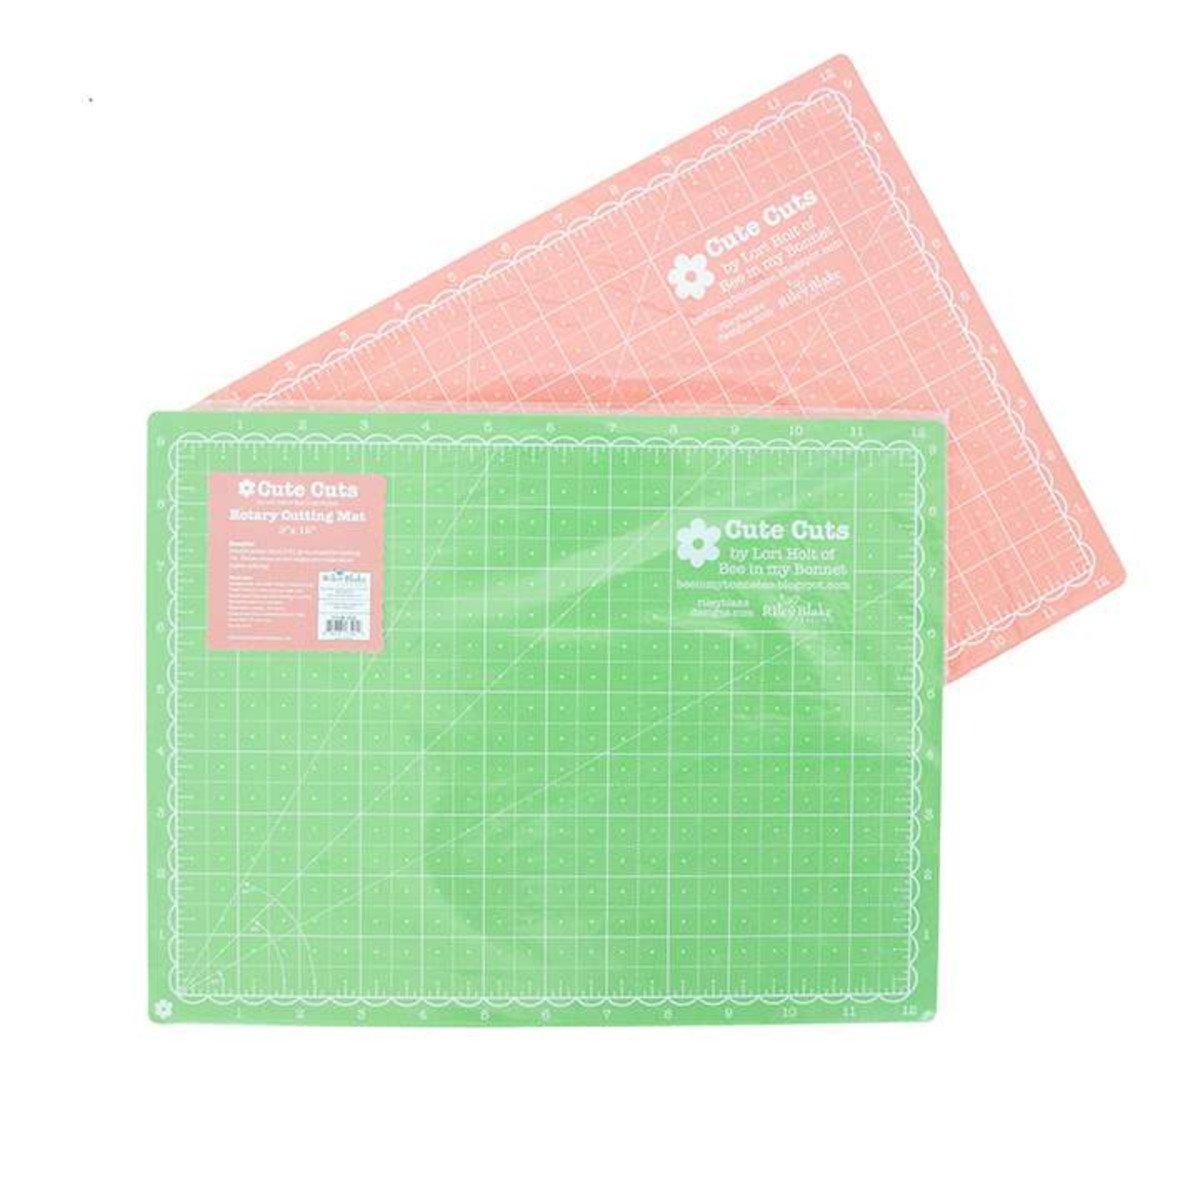 STCM-3592 9 x 12 Green/Coral Lori Holt Cutting Mat